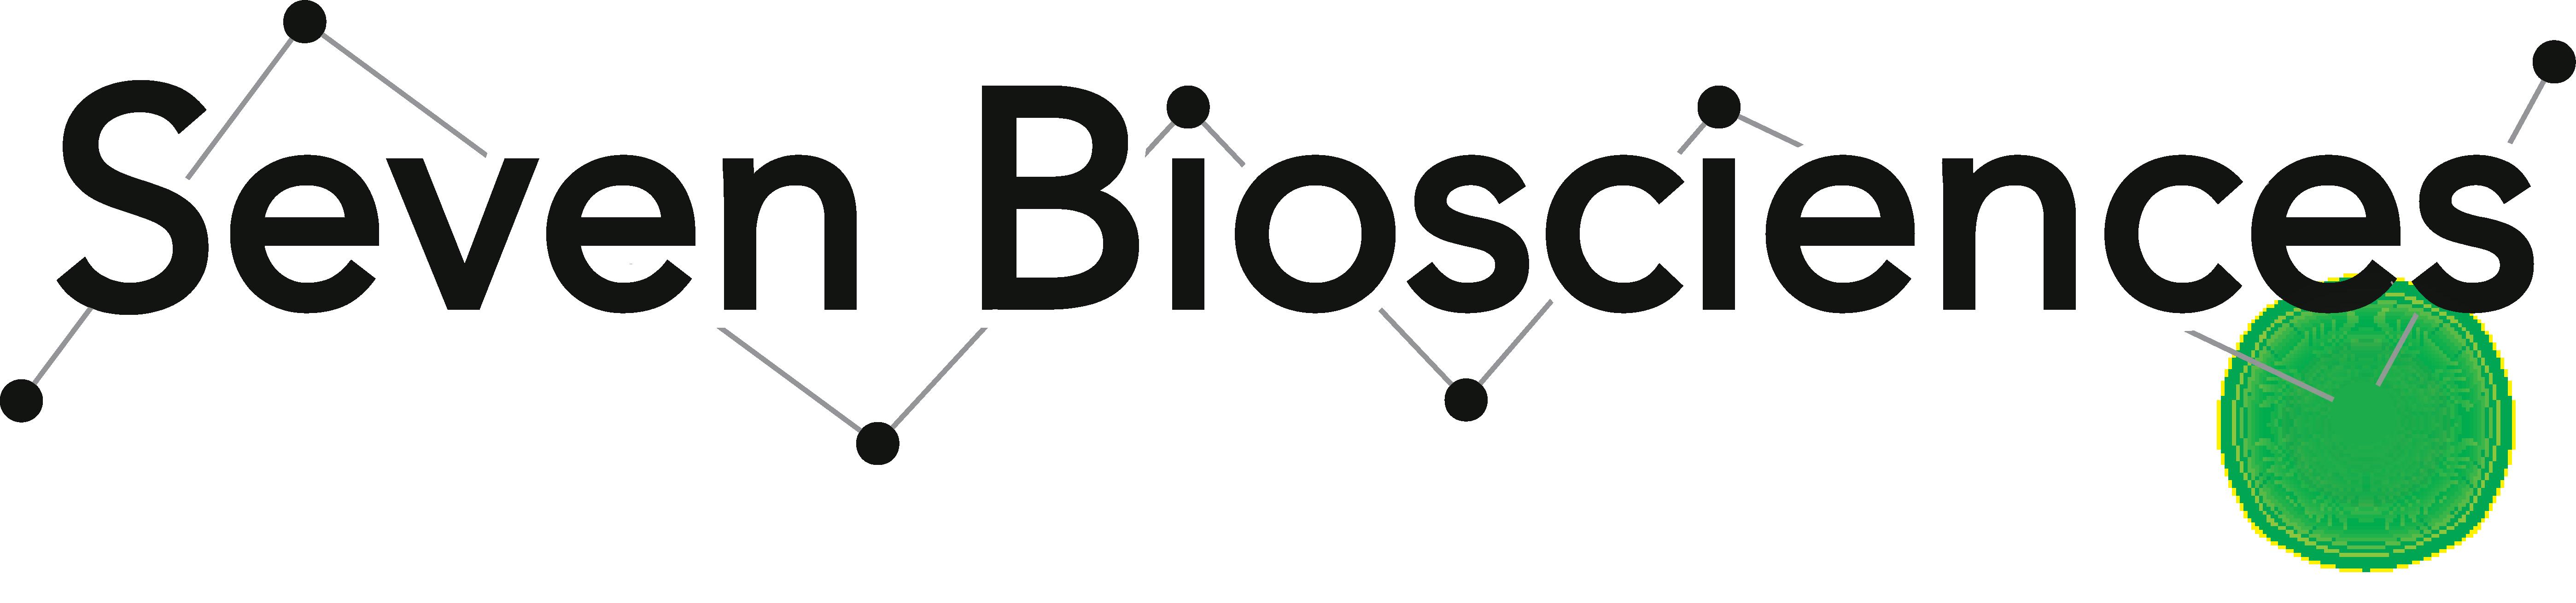 Seven Biosciences